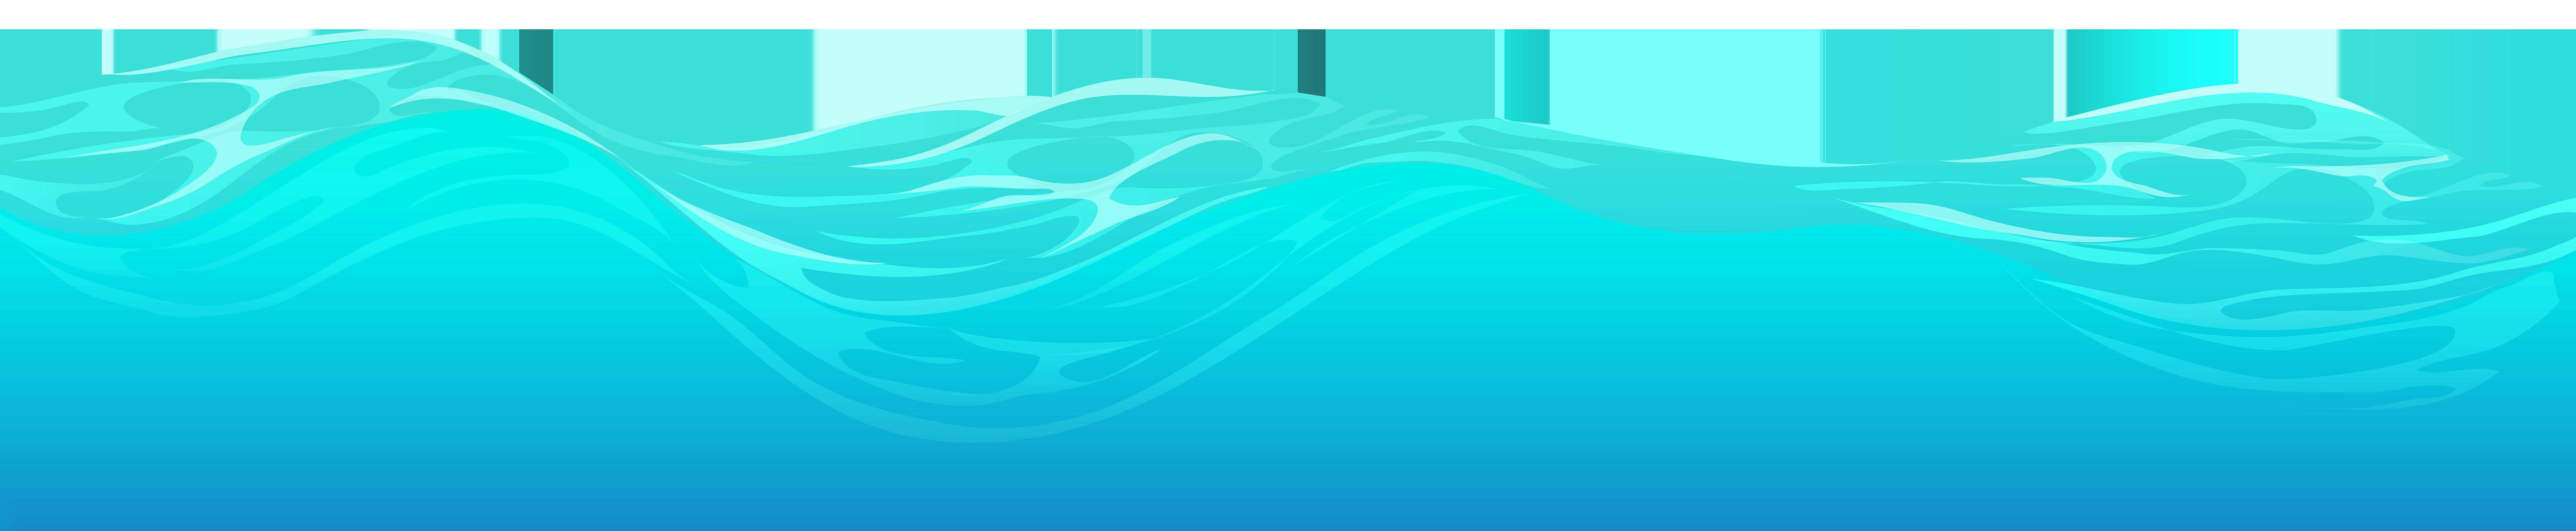 png transparent stock Ground clipart ocean. Sea png clip art